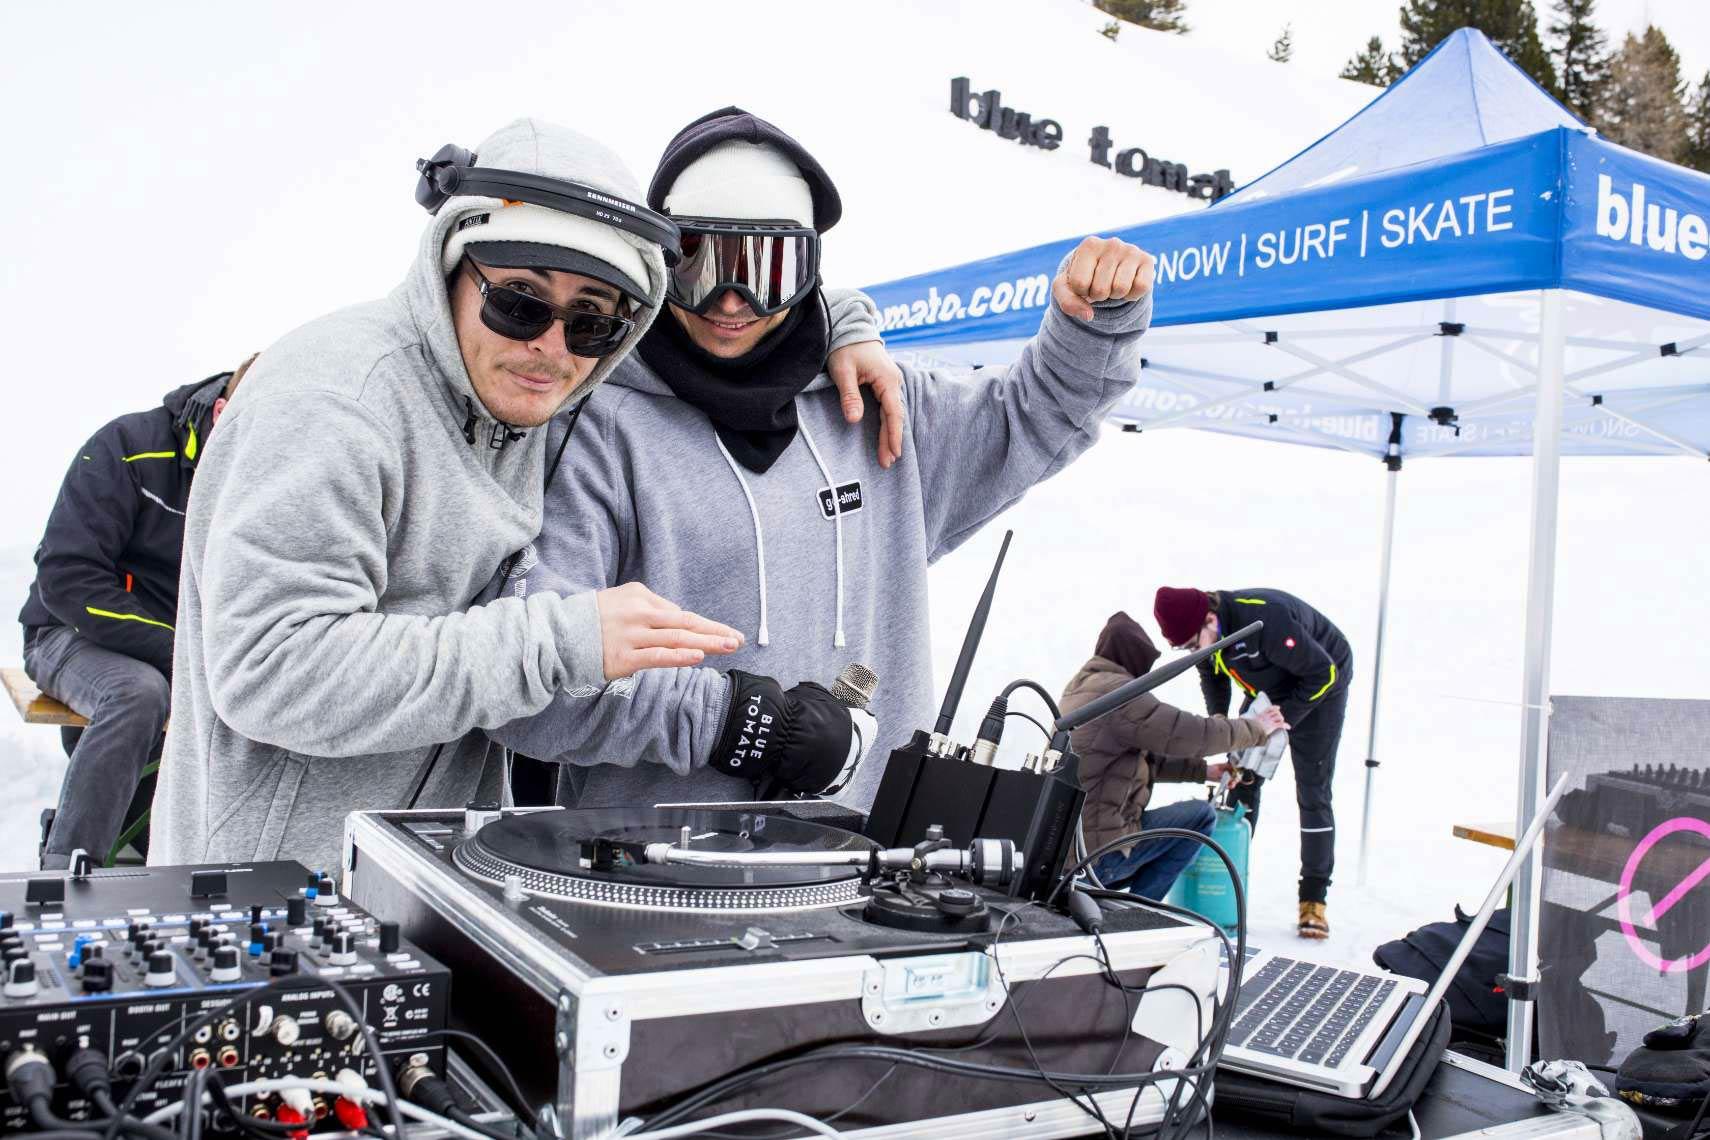 Good vibes Pt. 3 - DJ Kidd Salute aka Boozy (links) und Speaker Martin Winchenbach (Go-Shred) - Foto: Patrick Steiner